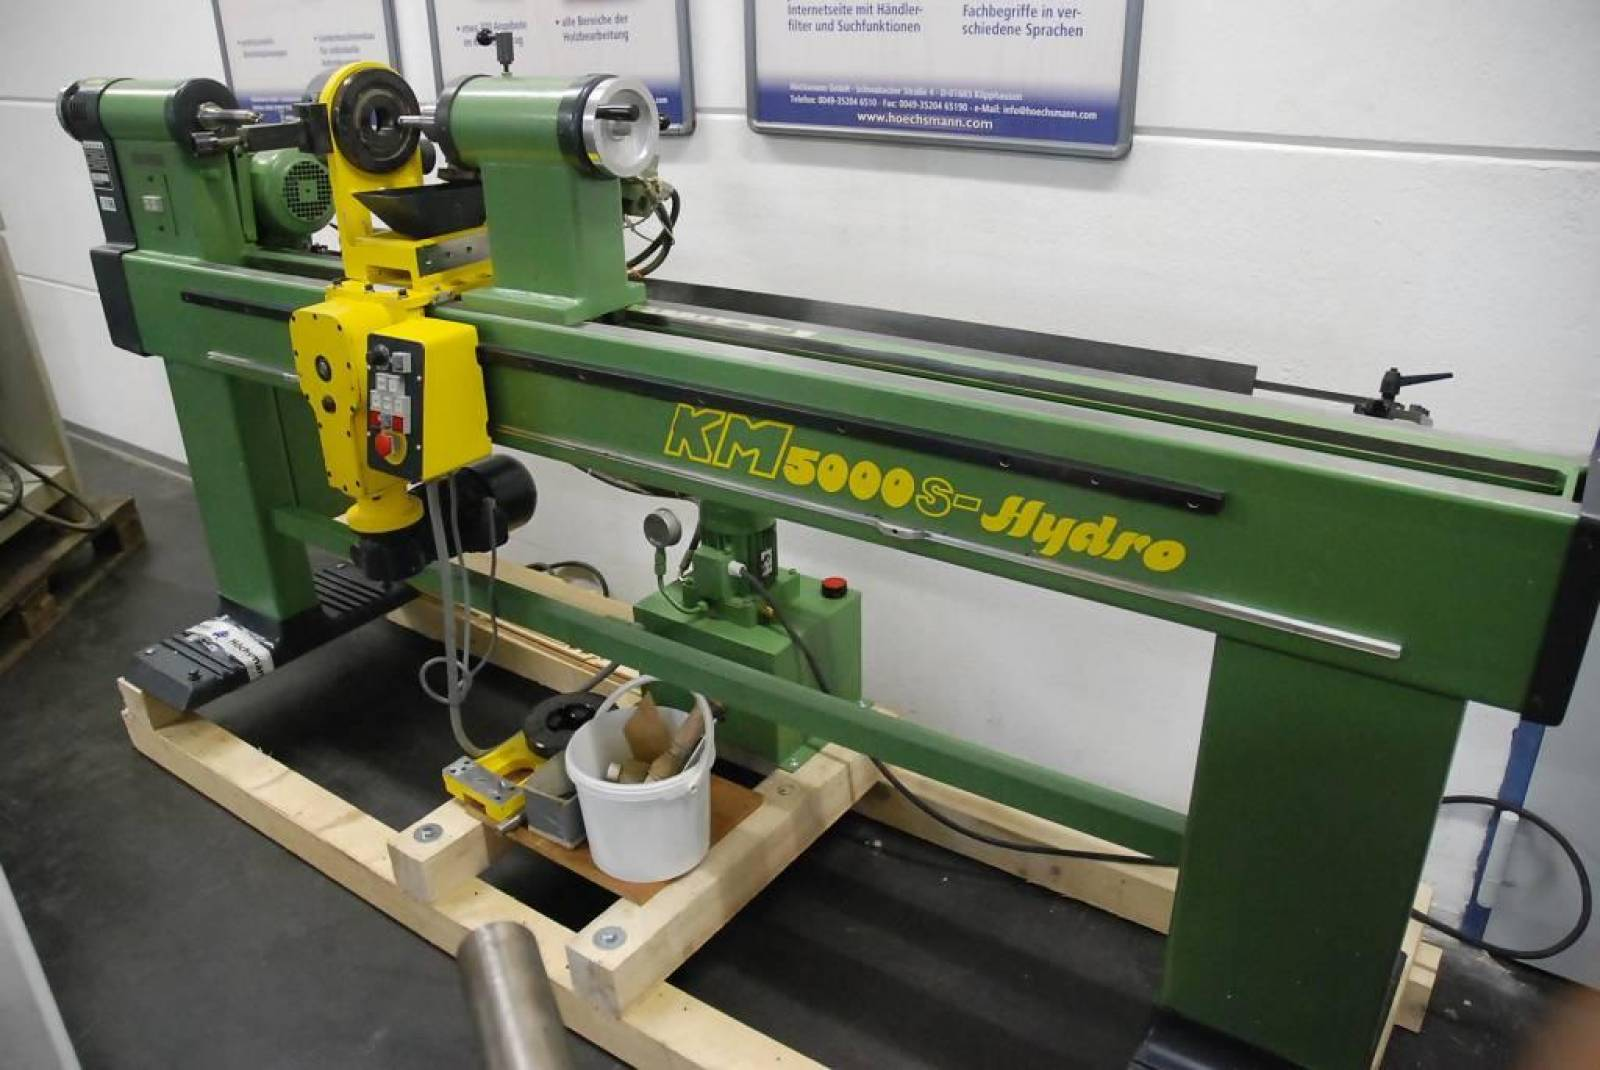 Automatic Wood Turning Lathe Killinger Km 5000 S Hydro Buy Second Hand